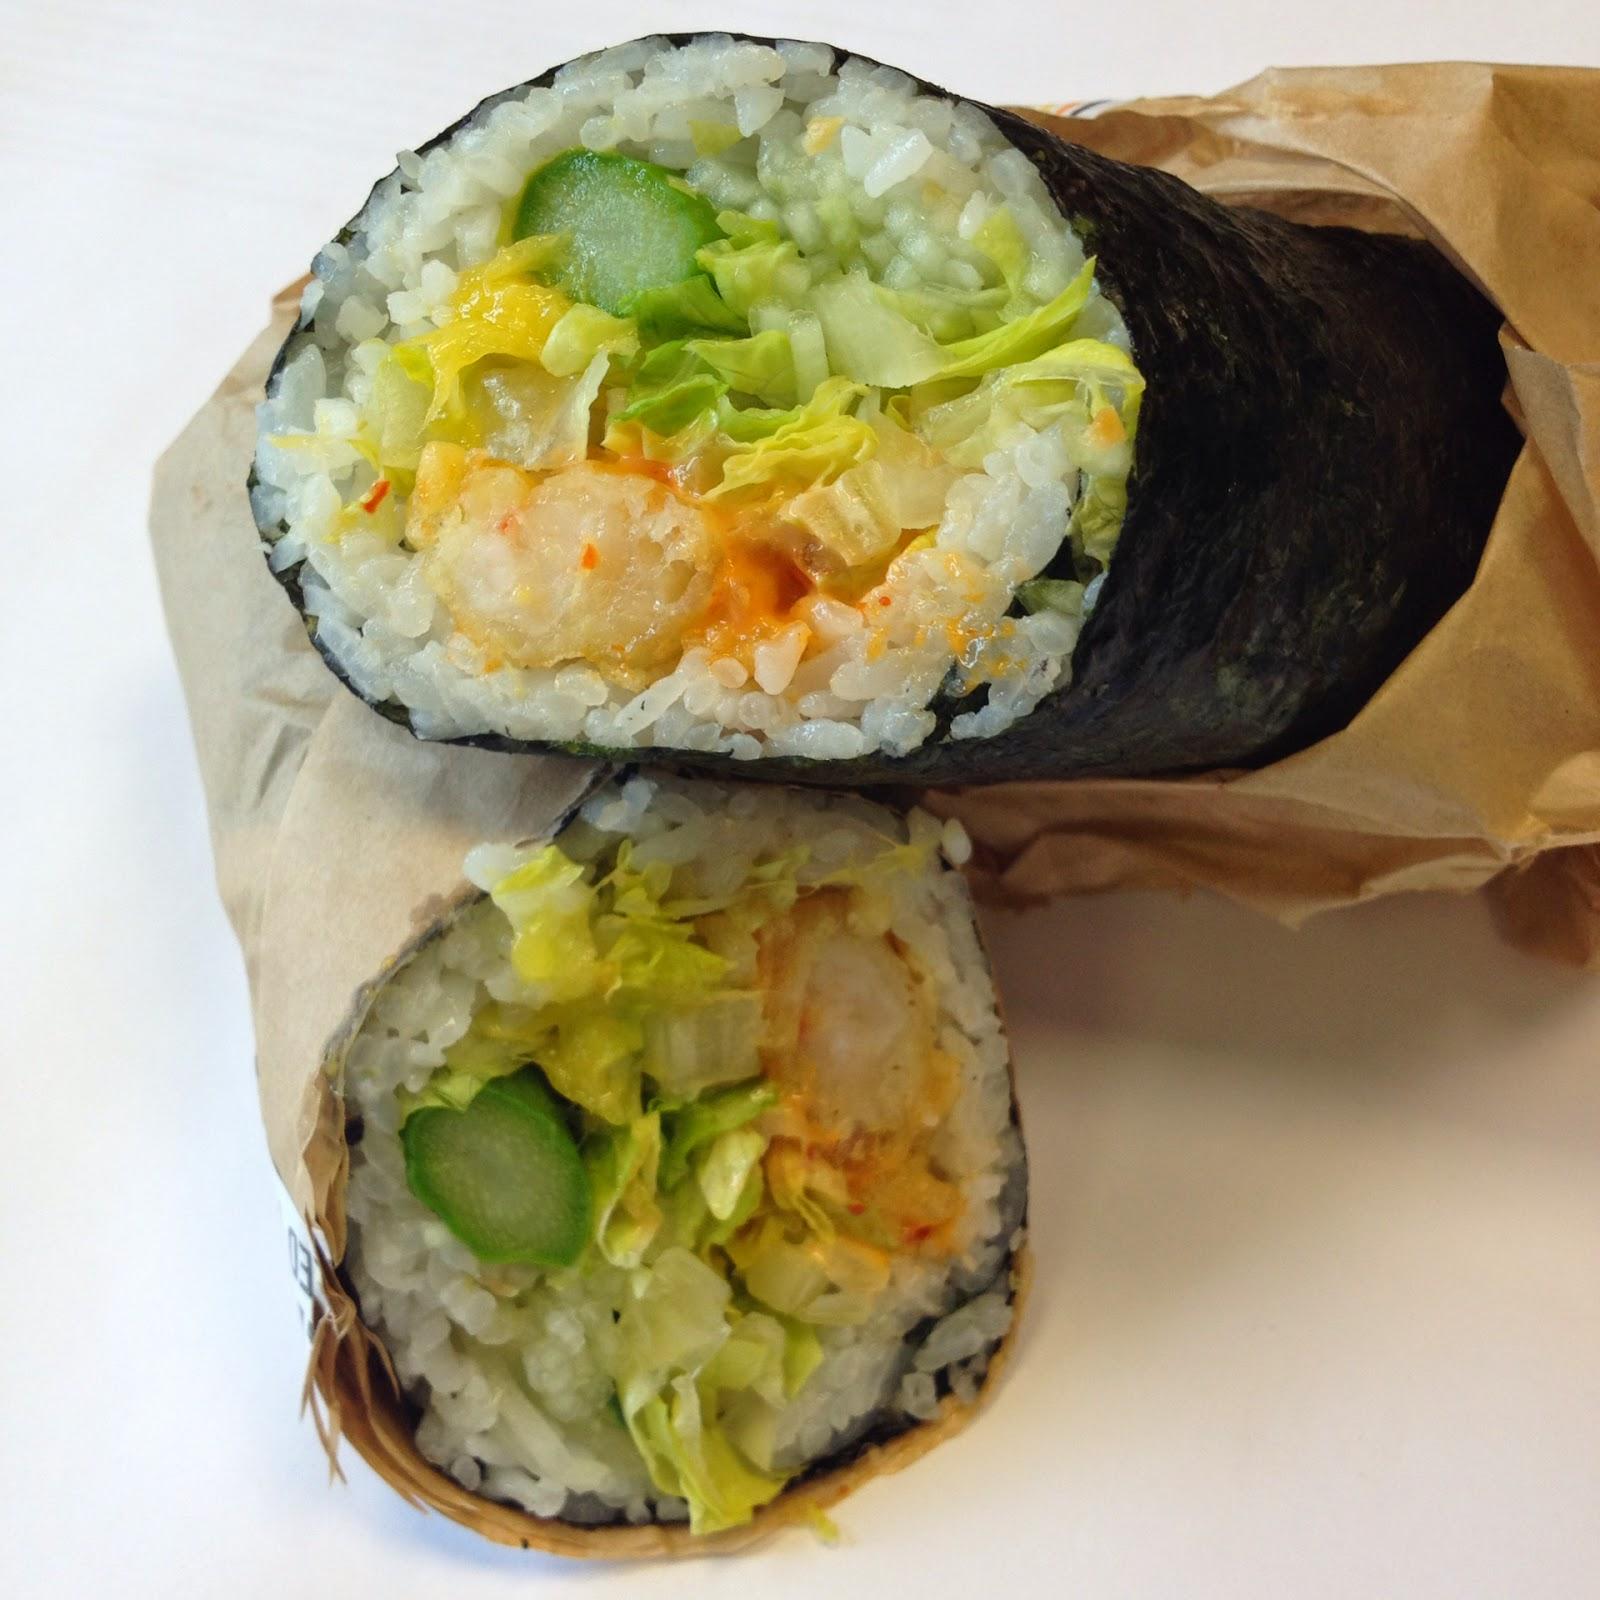 fidel gastro: free japanese burrito day at hai street kitchen & co